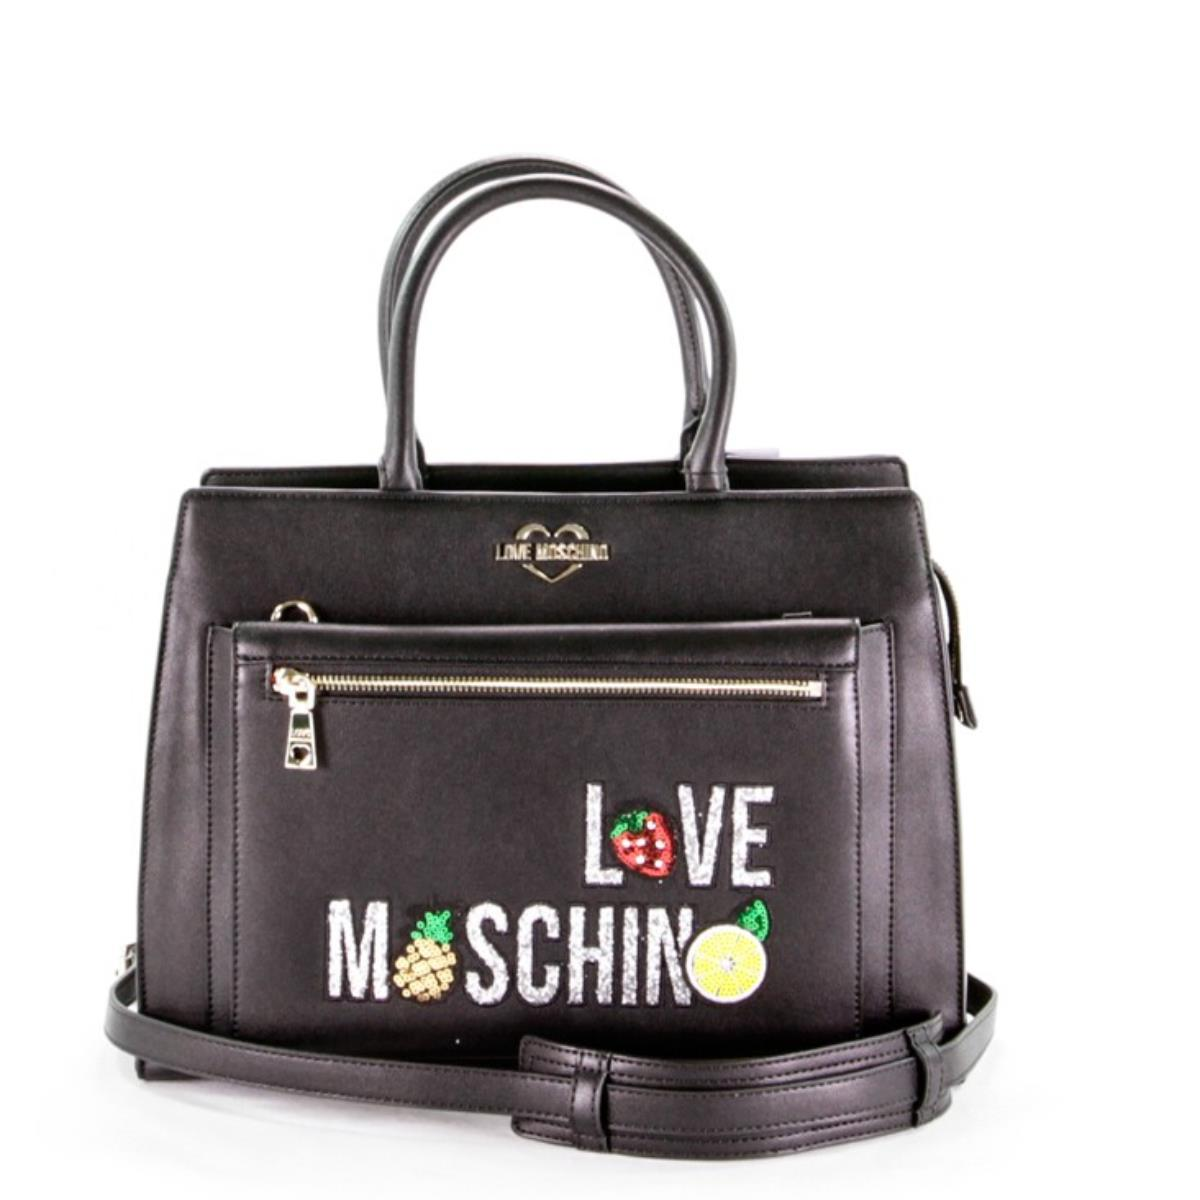 Love Moschino borsa a mano nera 4274